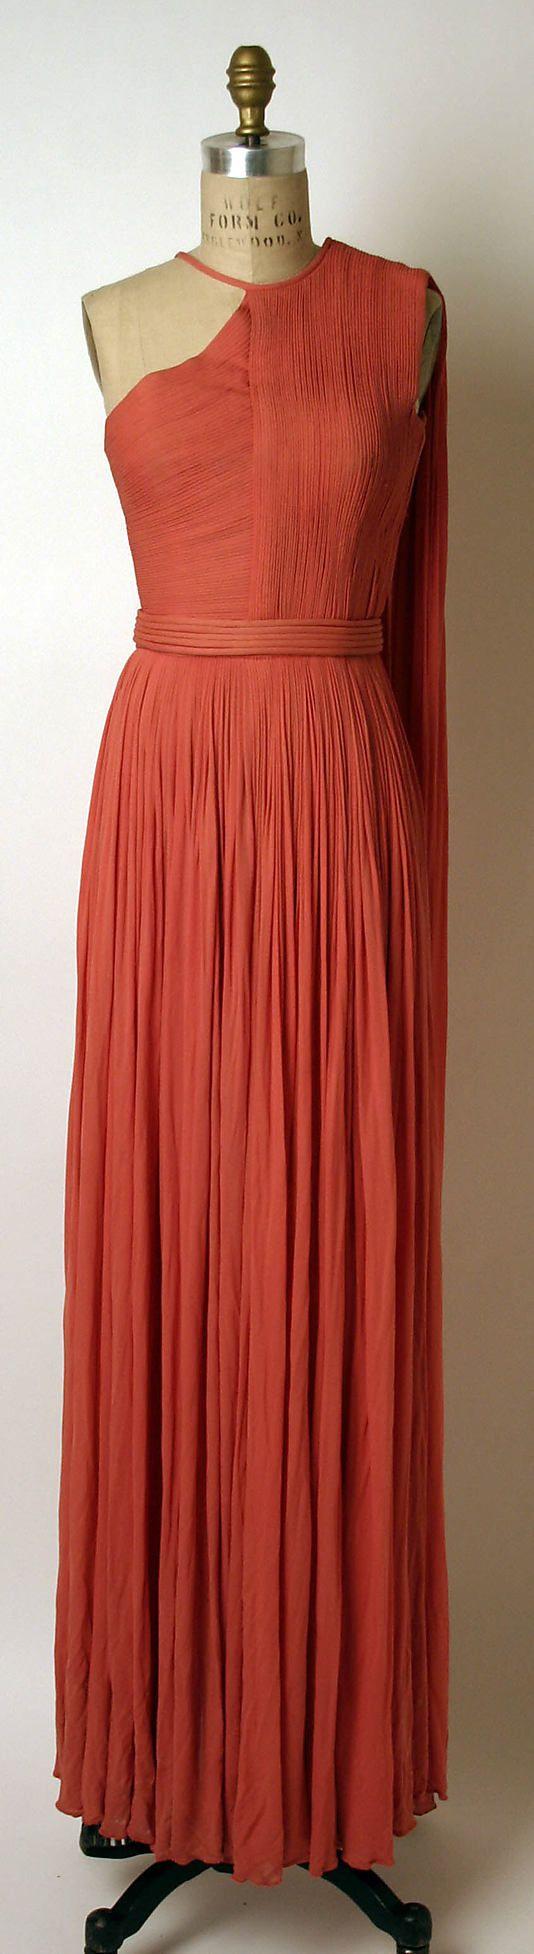 Madam french red dress